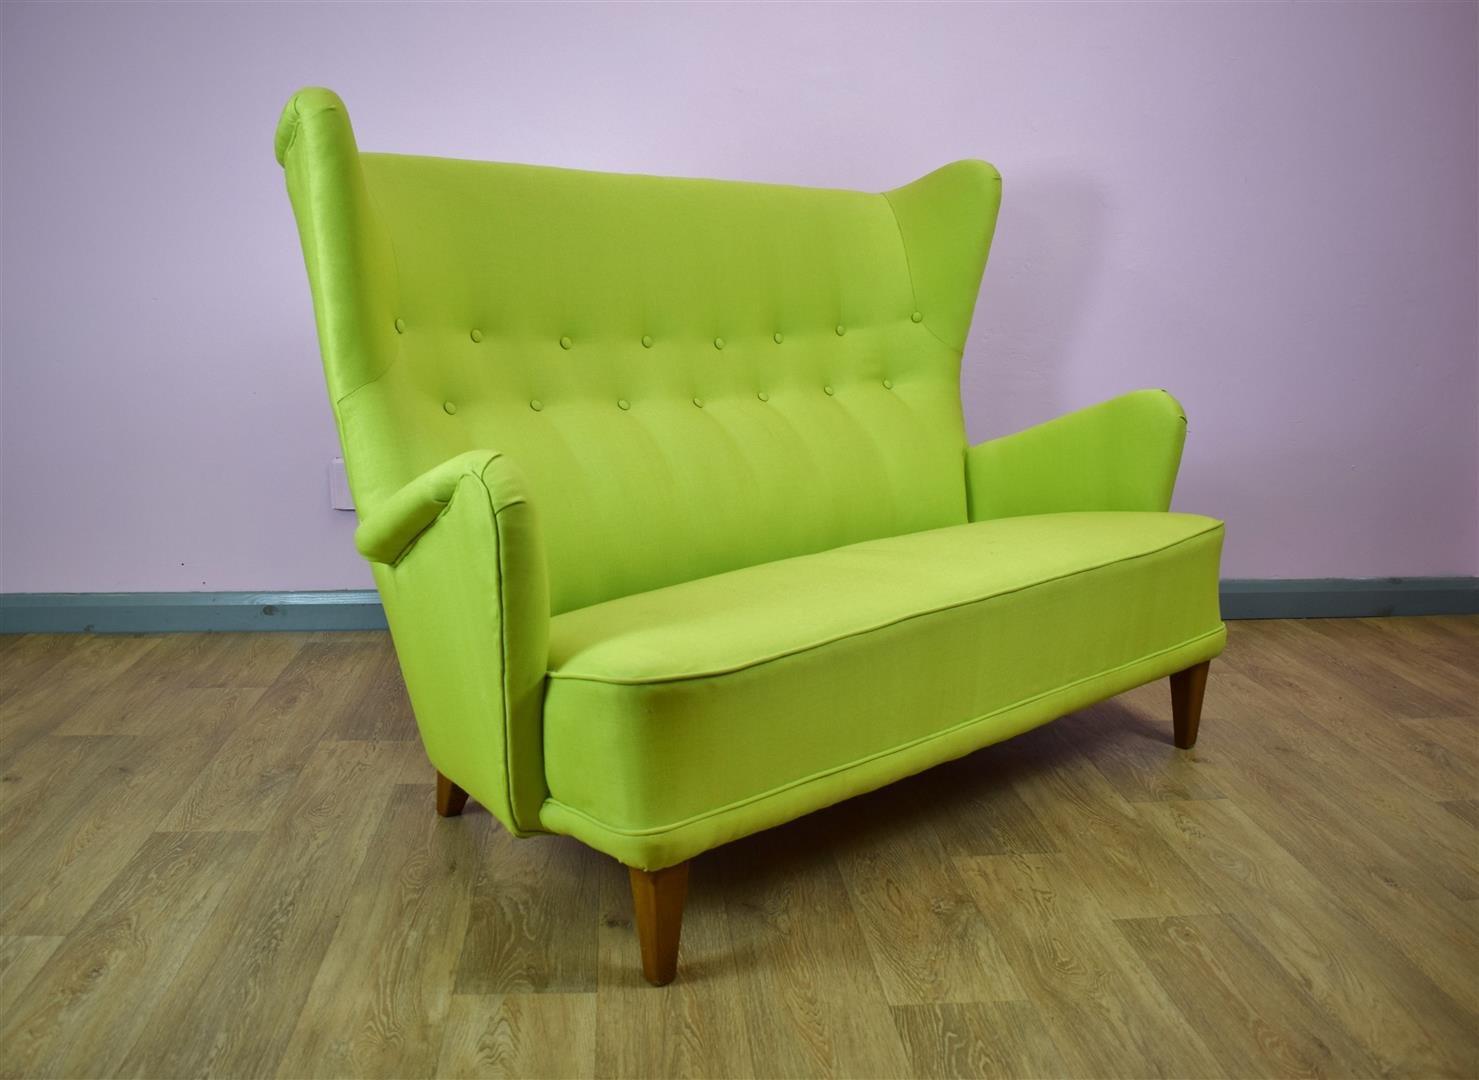 canap de dos plazas dan s a os 50 en venta en pamono. Black Bedroom Furniture Sets. Home Design Ideas